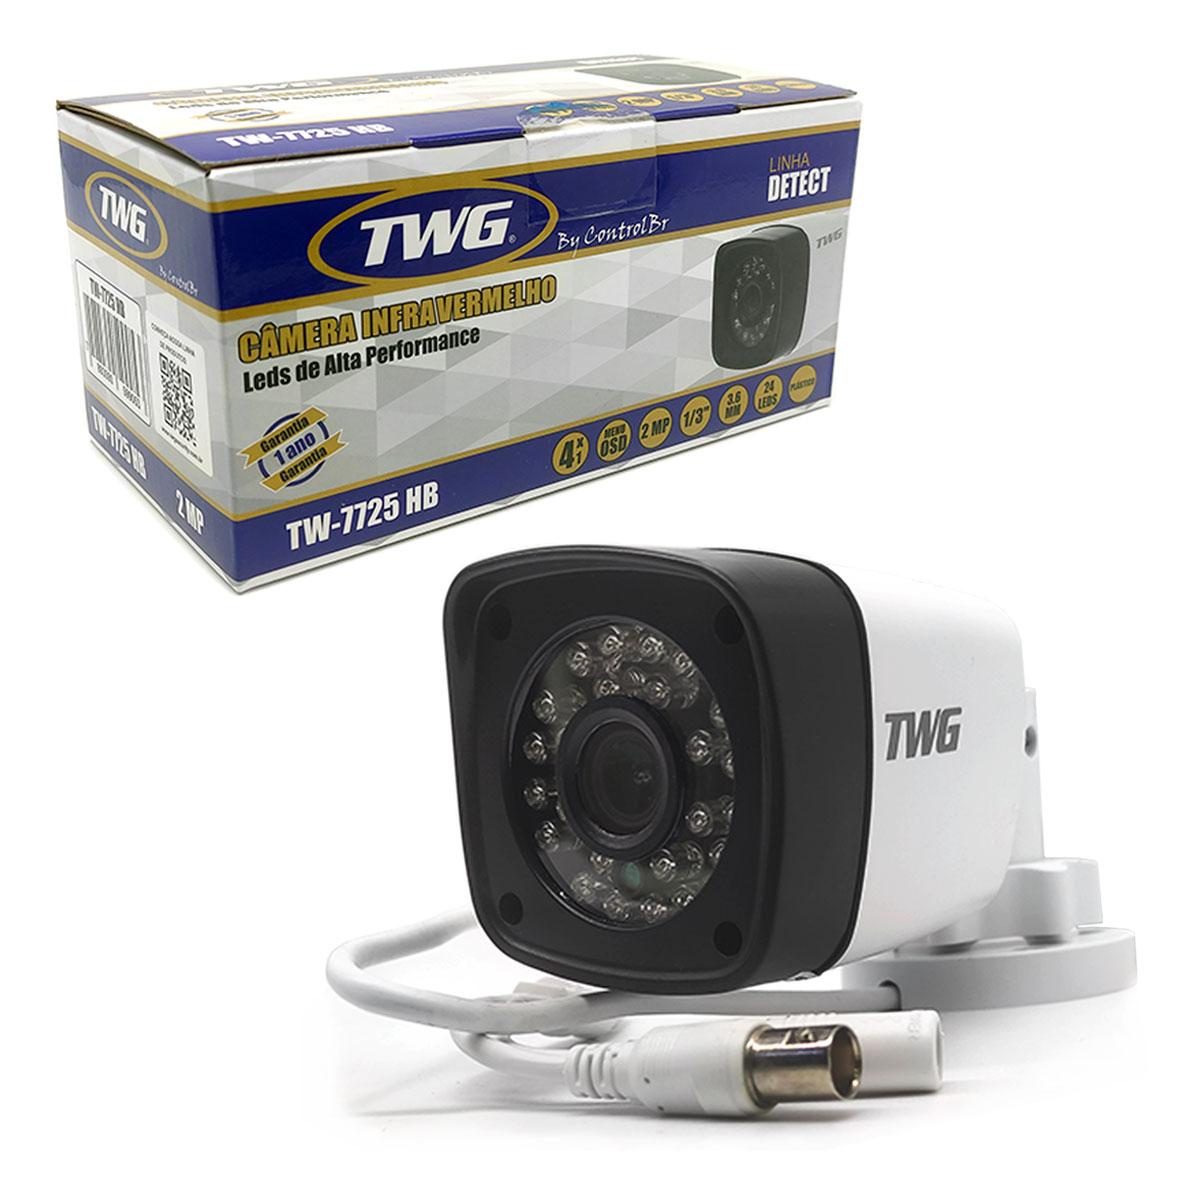 Câmera Bullet TWG TW-7725 HB, Full HD, 4x1, 2MP, 1/3, 3.6mm, 24 Leds, IP66 - DETECT